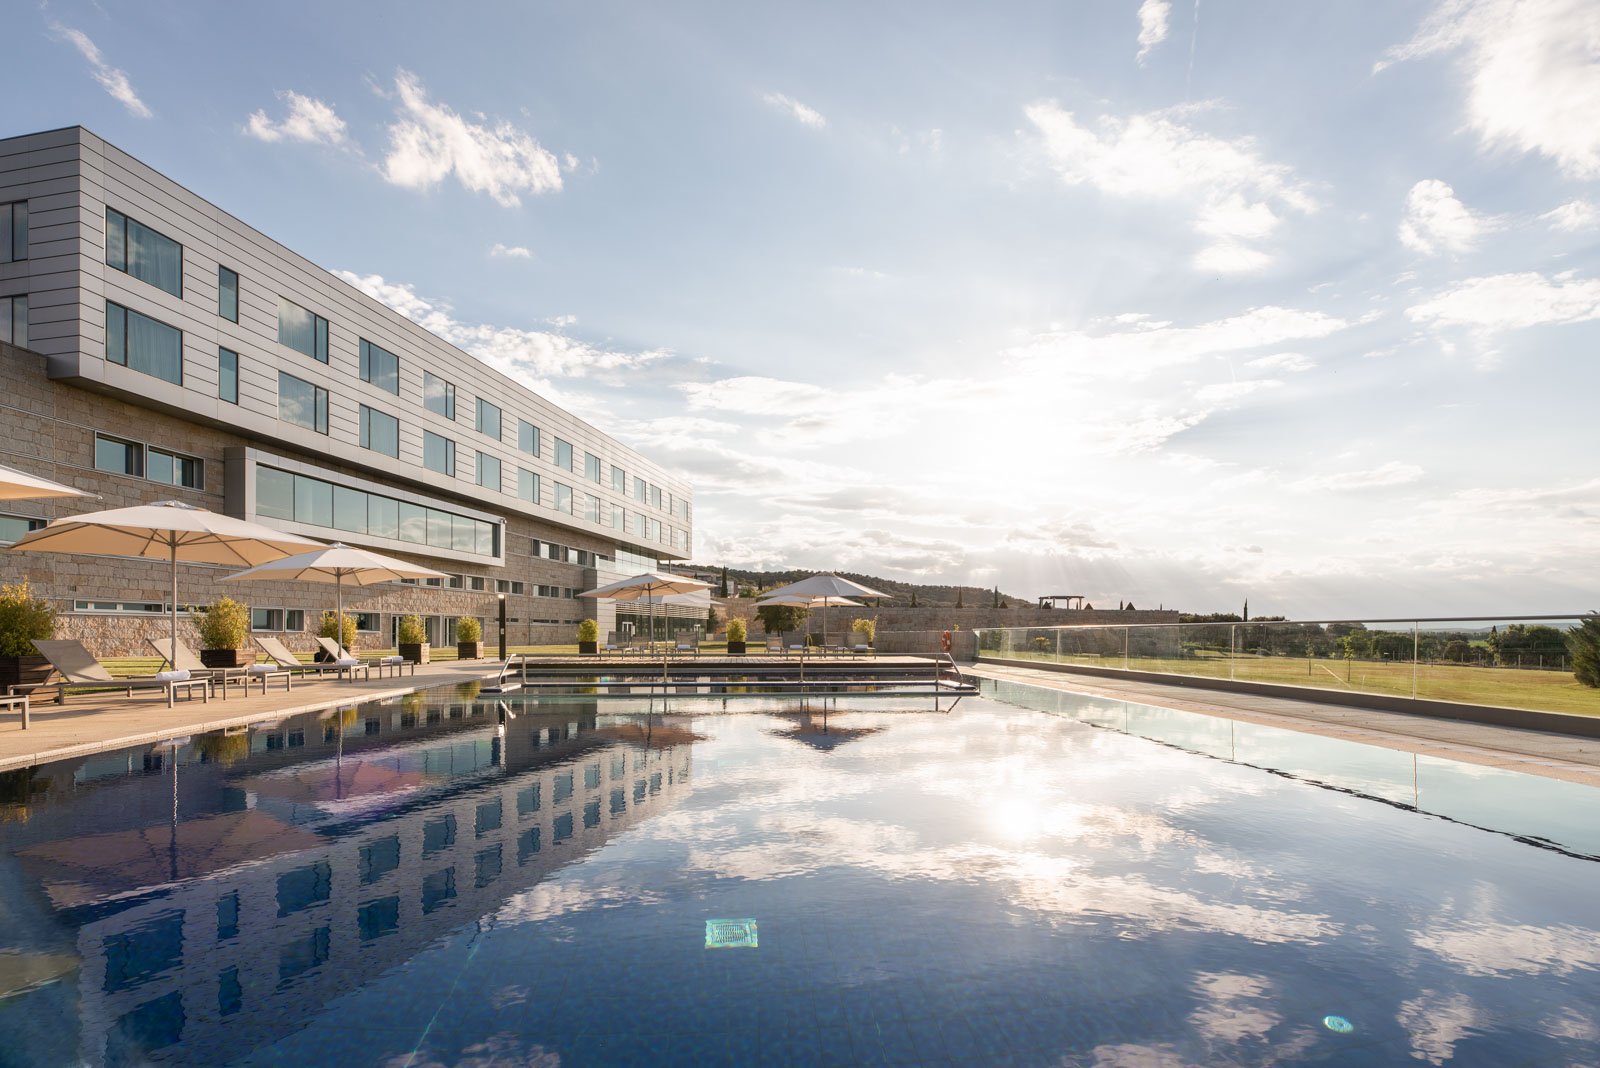 Valbusenda Hotel